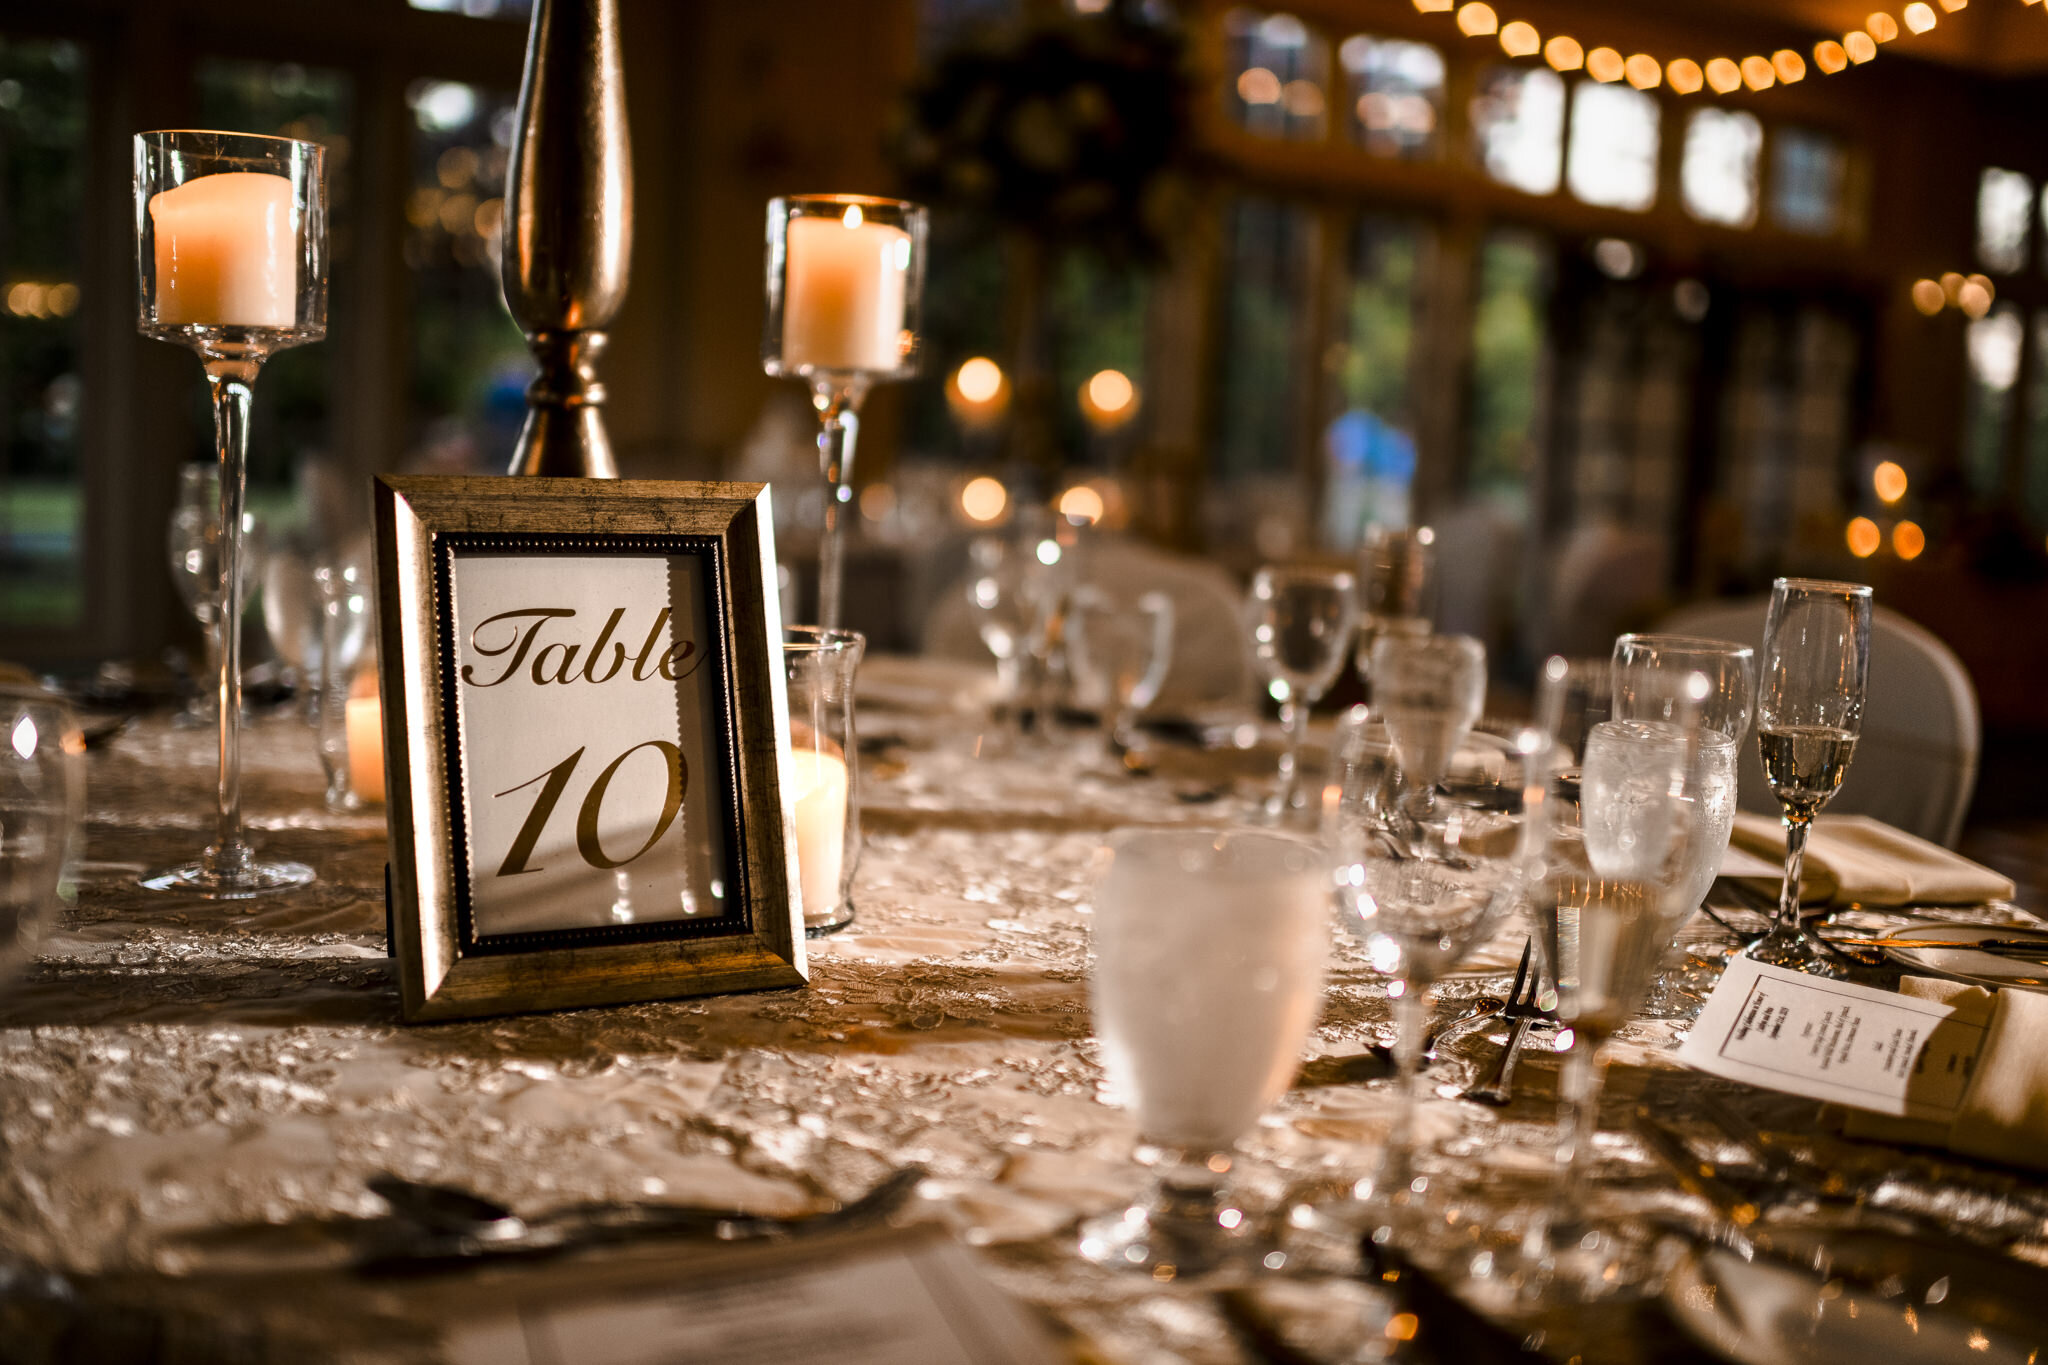 Coyle-Forsgate-Country-Club-Wedding-Photographer-35.JPG